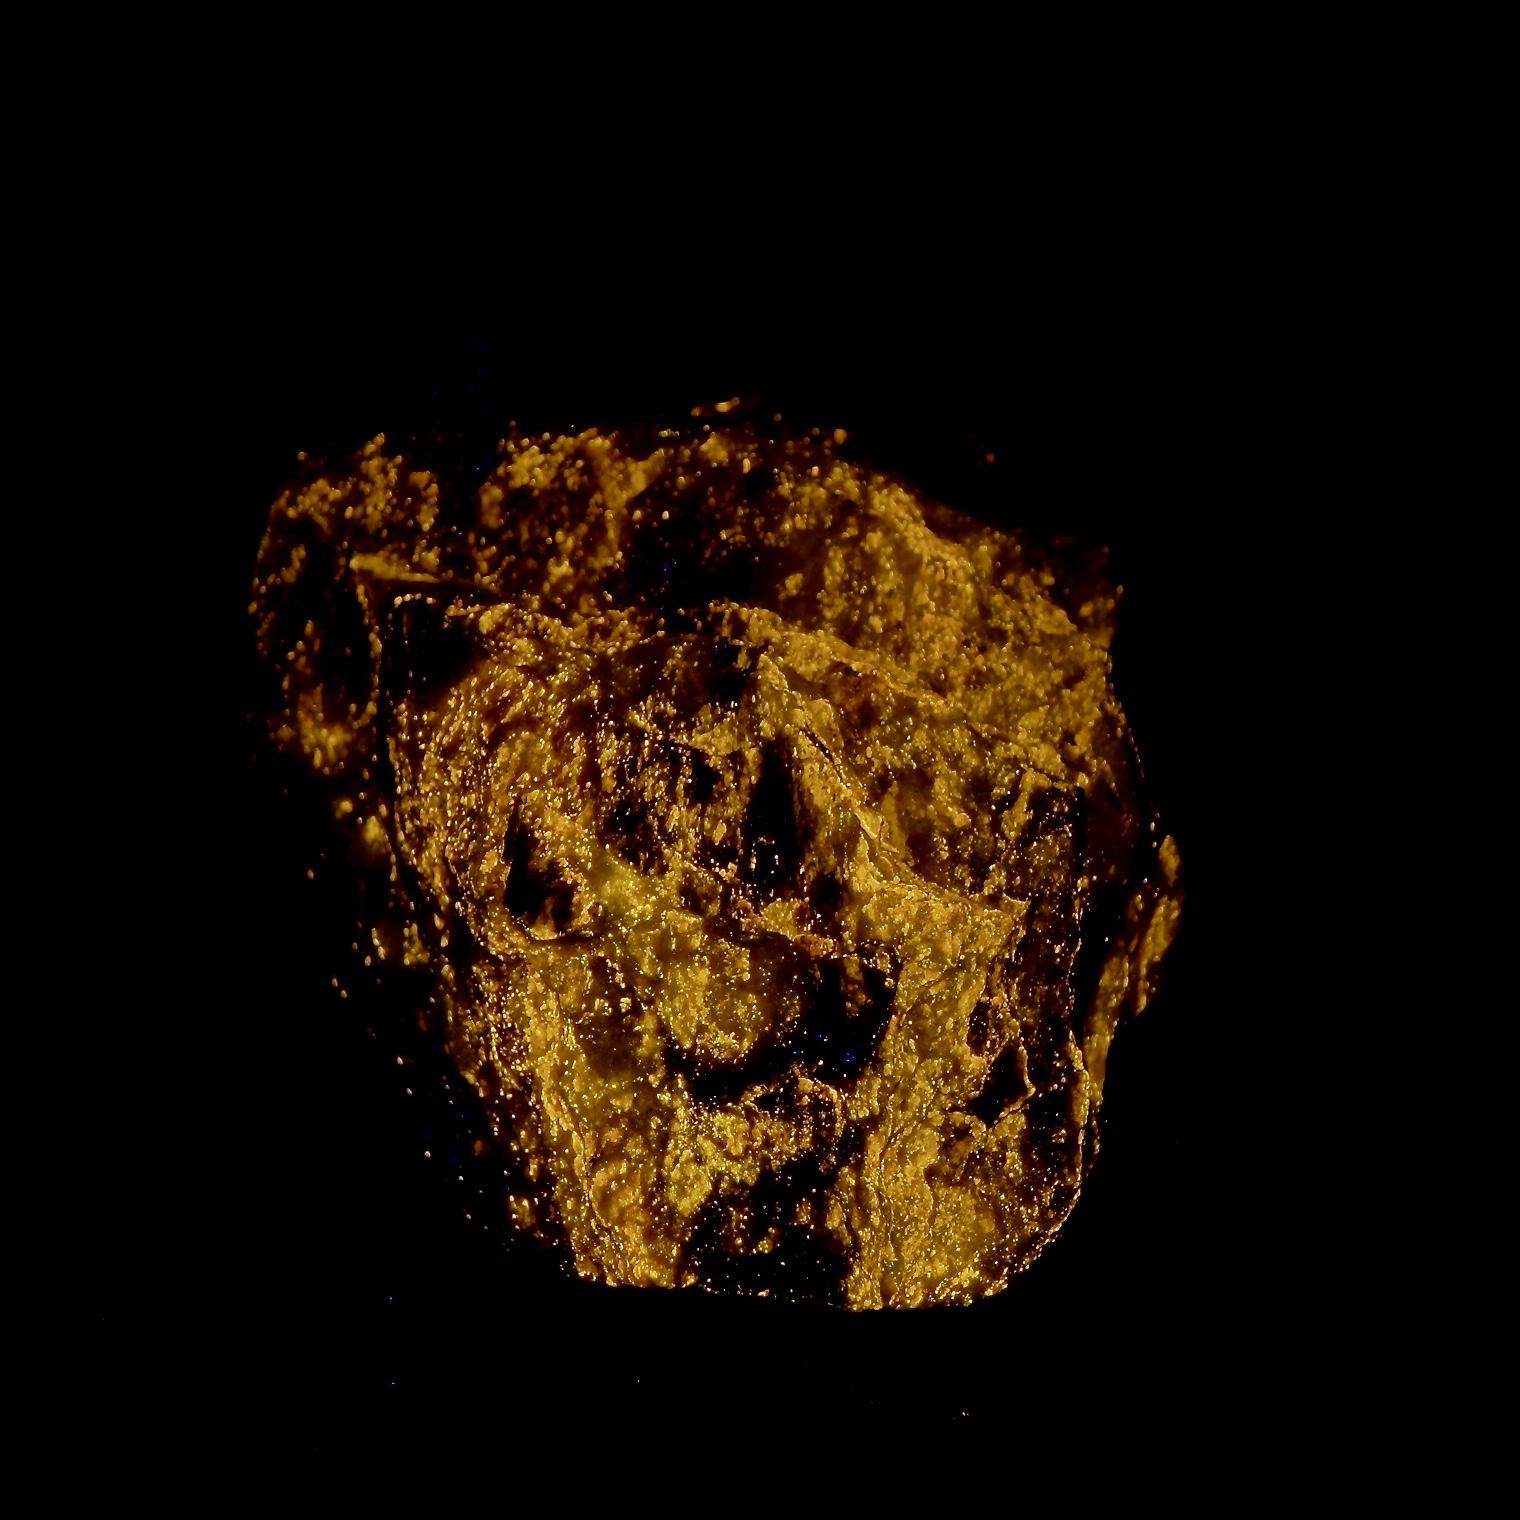 Colección de Minerales Fluorescentes - Página 5 Fullsi43